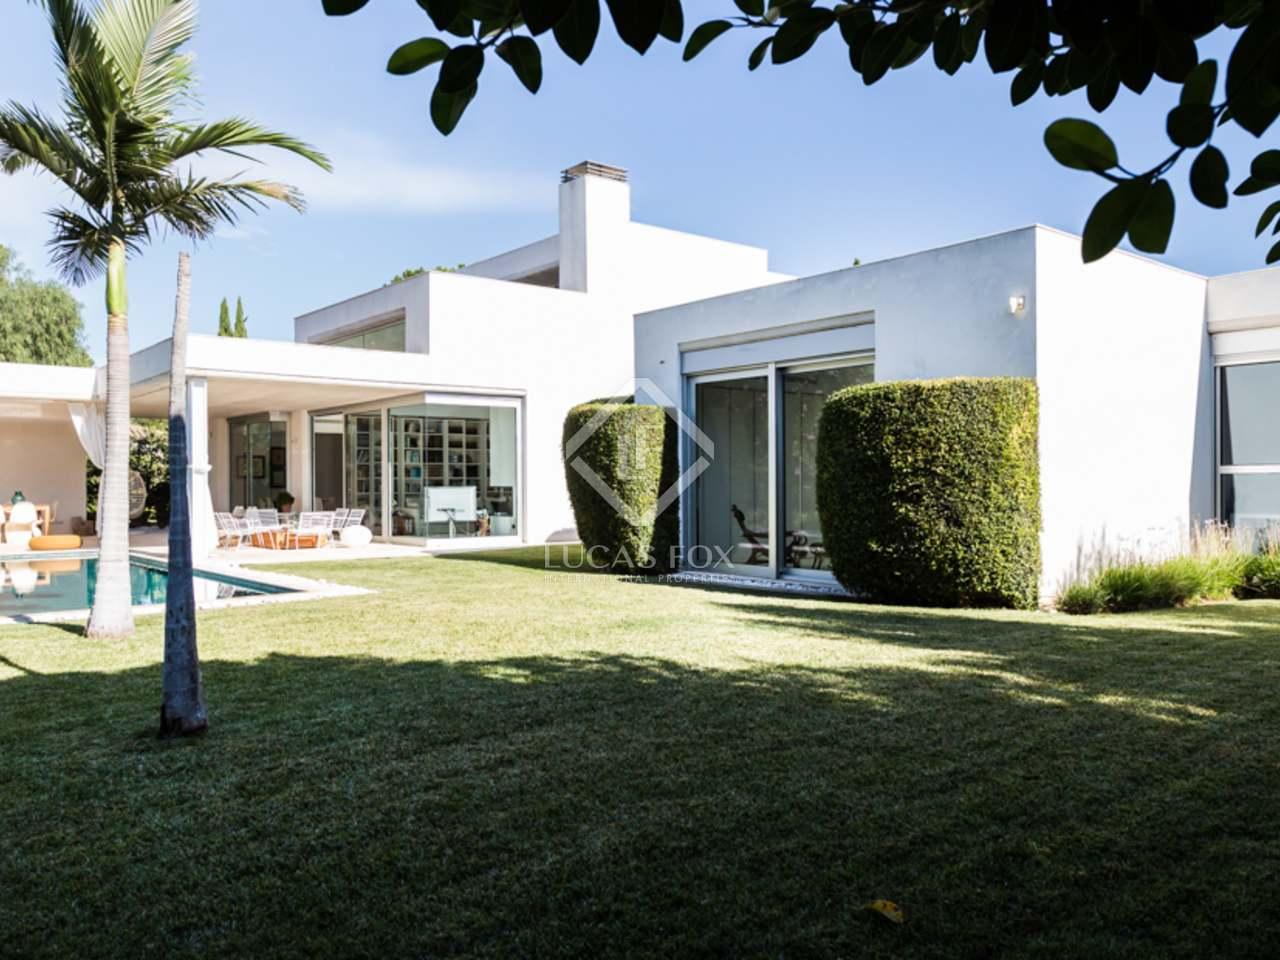 Villa de luxe en vente santa b rbara valence - Belle maison valencia tucson fratantoni design ...